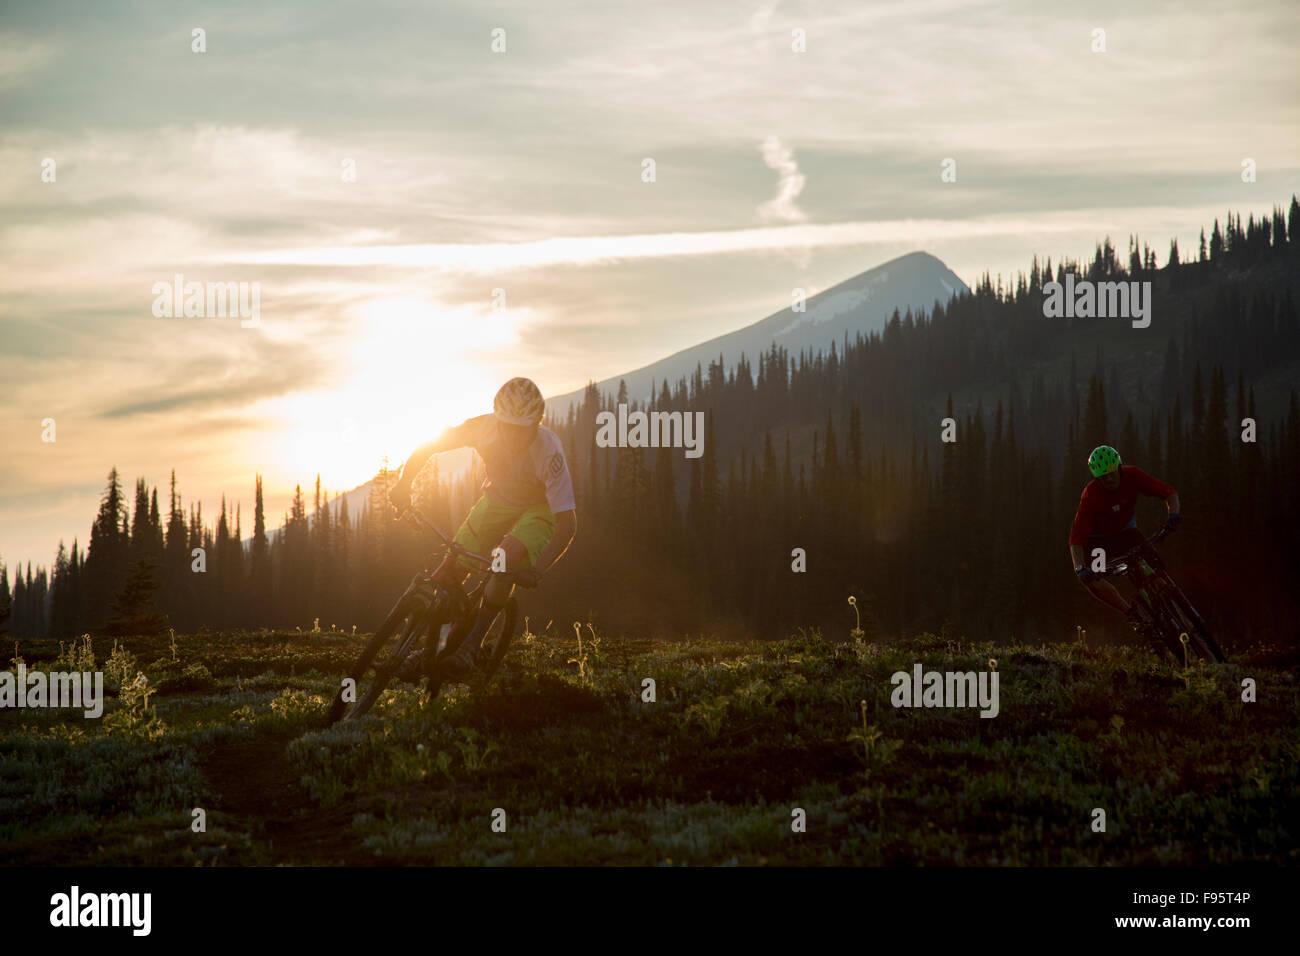 Mountain Biking, Singletrack, Mount Fostall, Monashee Mountains, Sol Mountain Lodge, British Columbia, Canada - Stock Image